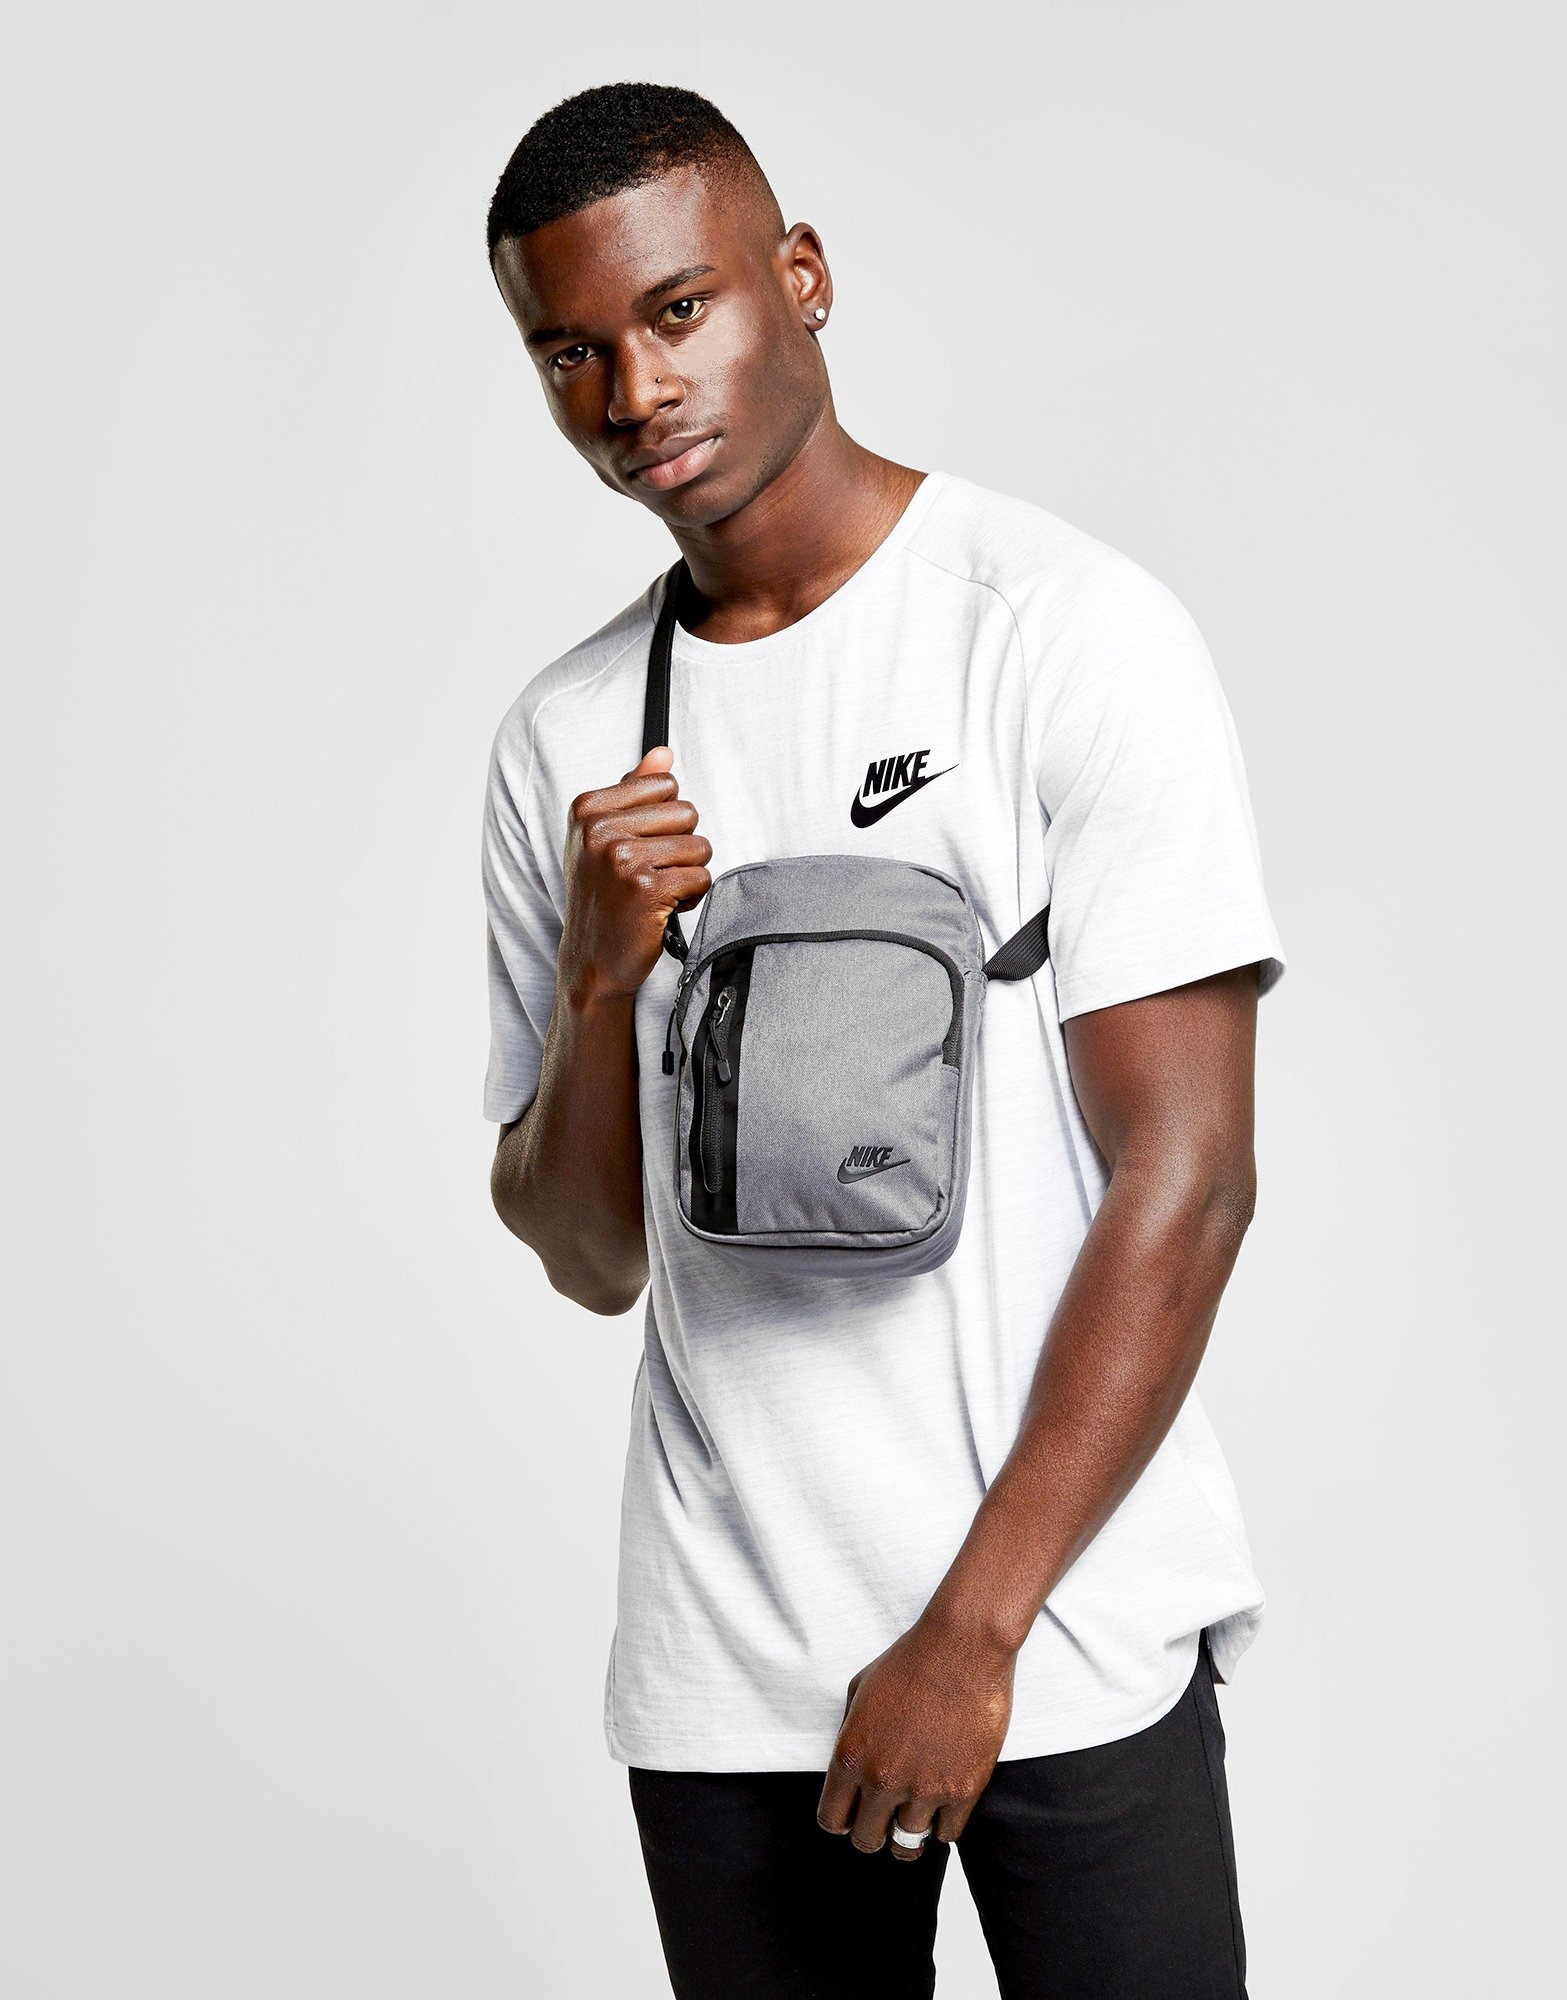 Nike Core Small Crossbody Bag grey 50% off!